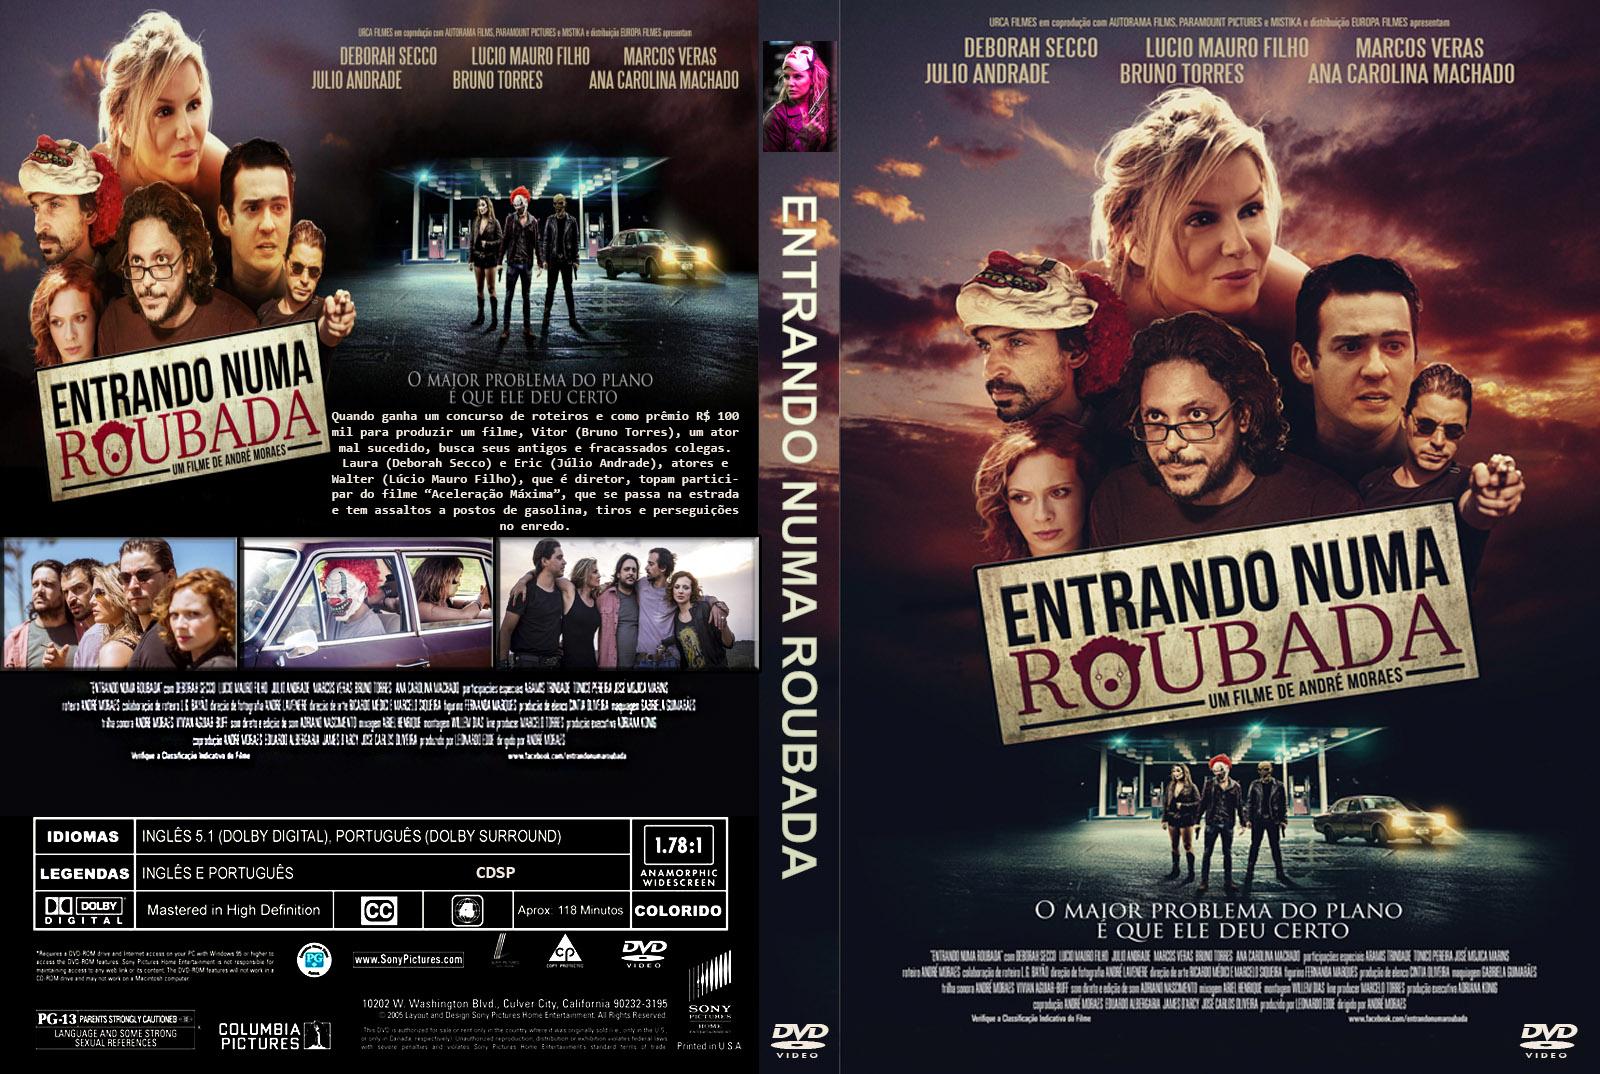 Download Entrando Numa Roubada HDRip XviD Nacional ENTRANDO 2BNUMA 2BROUBADA